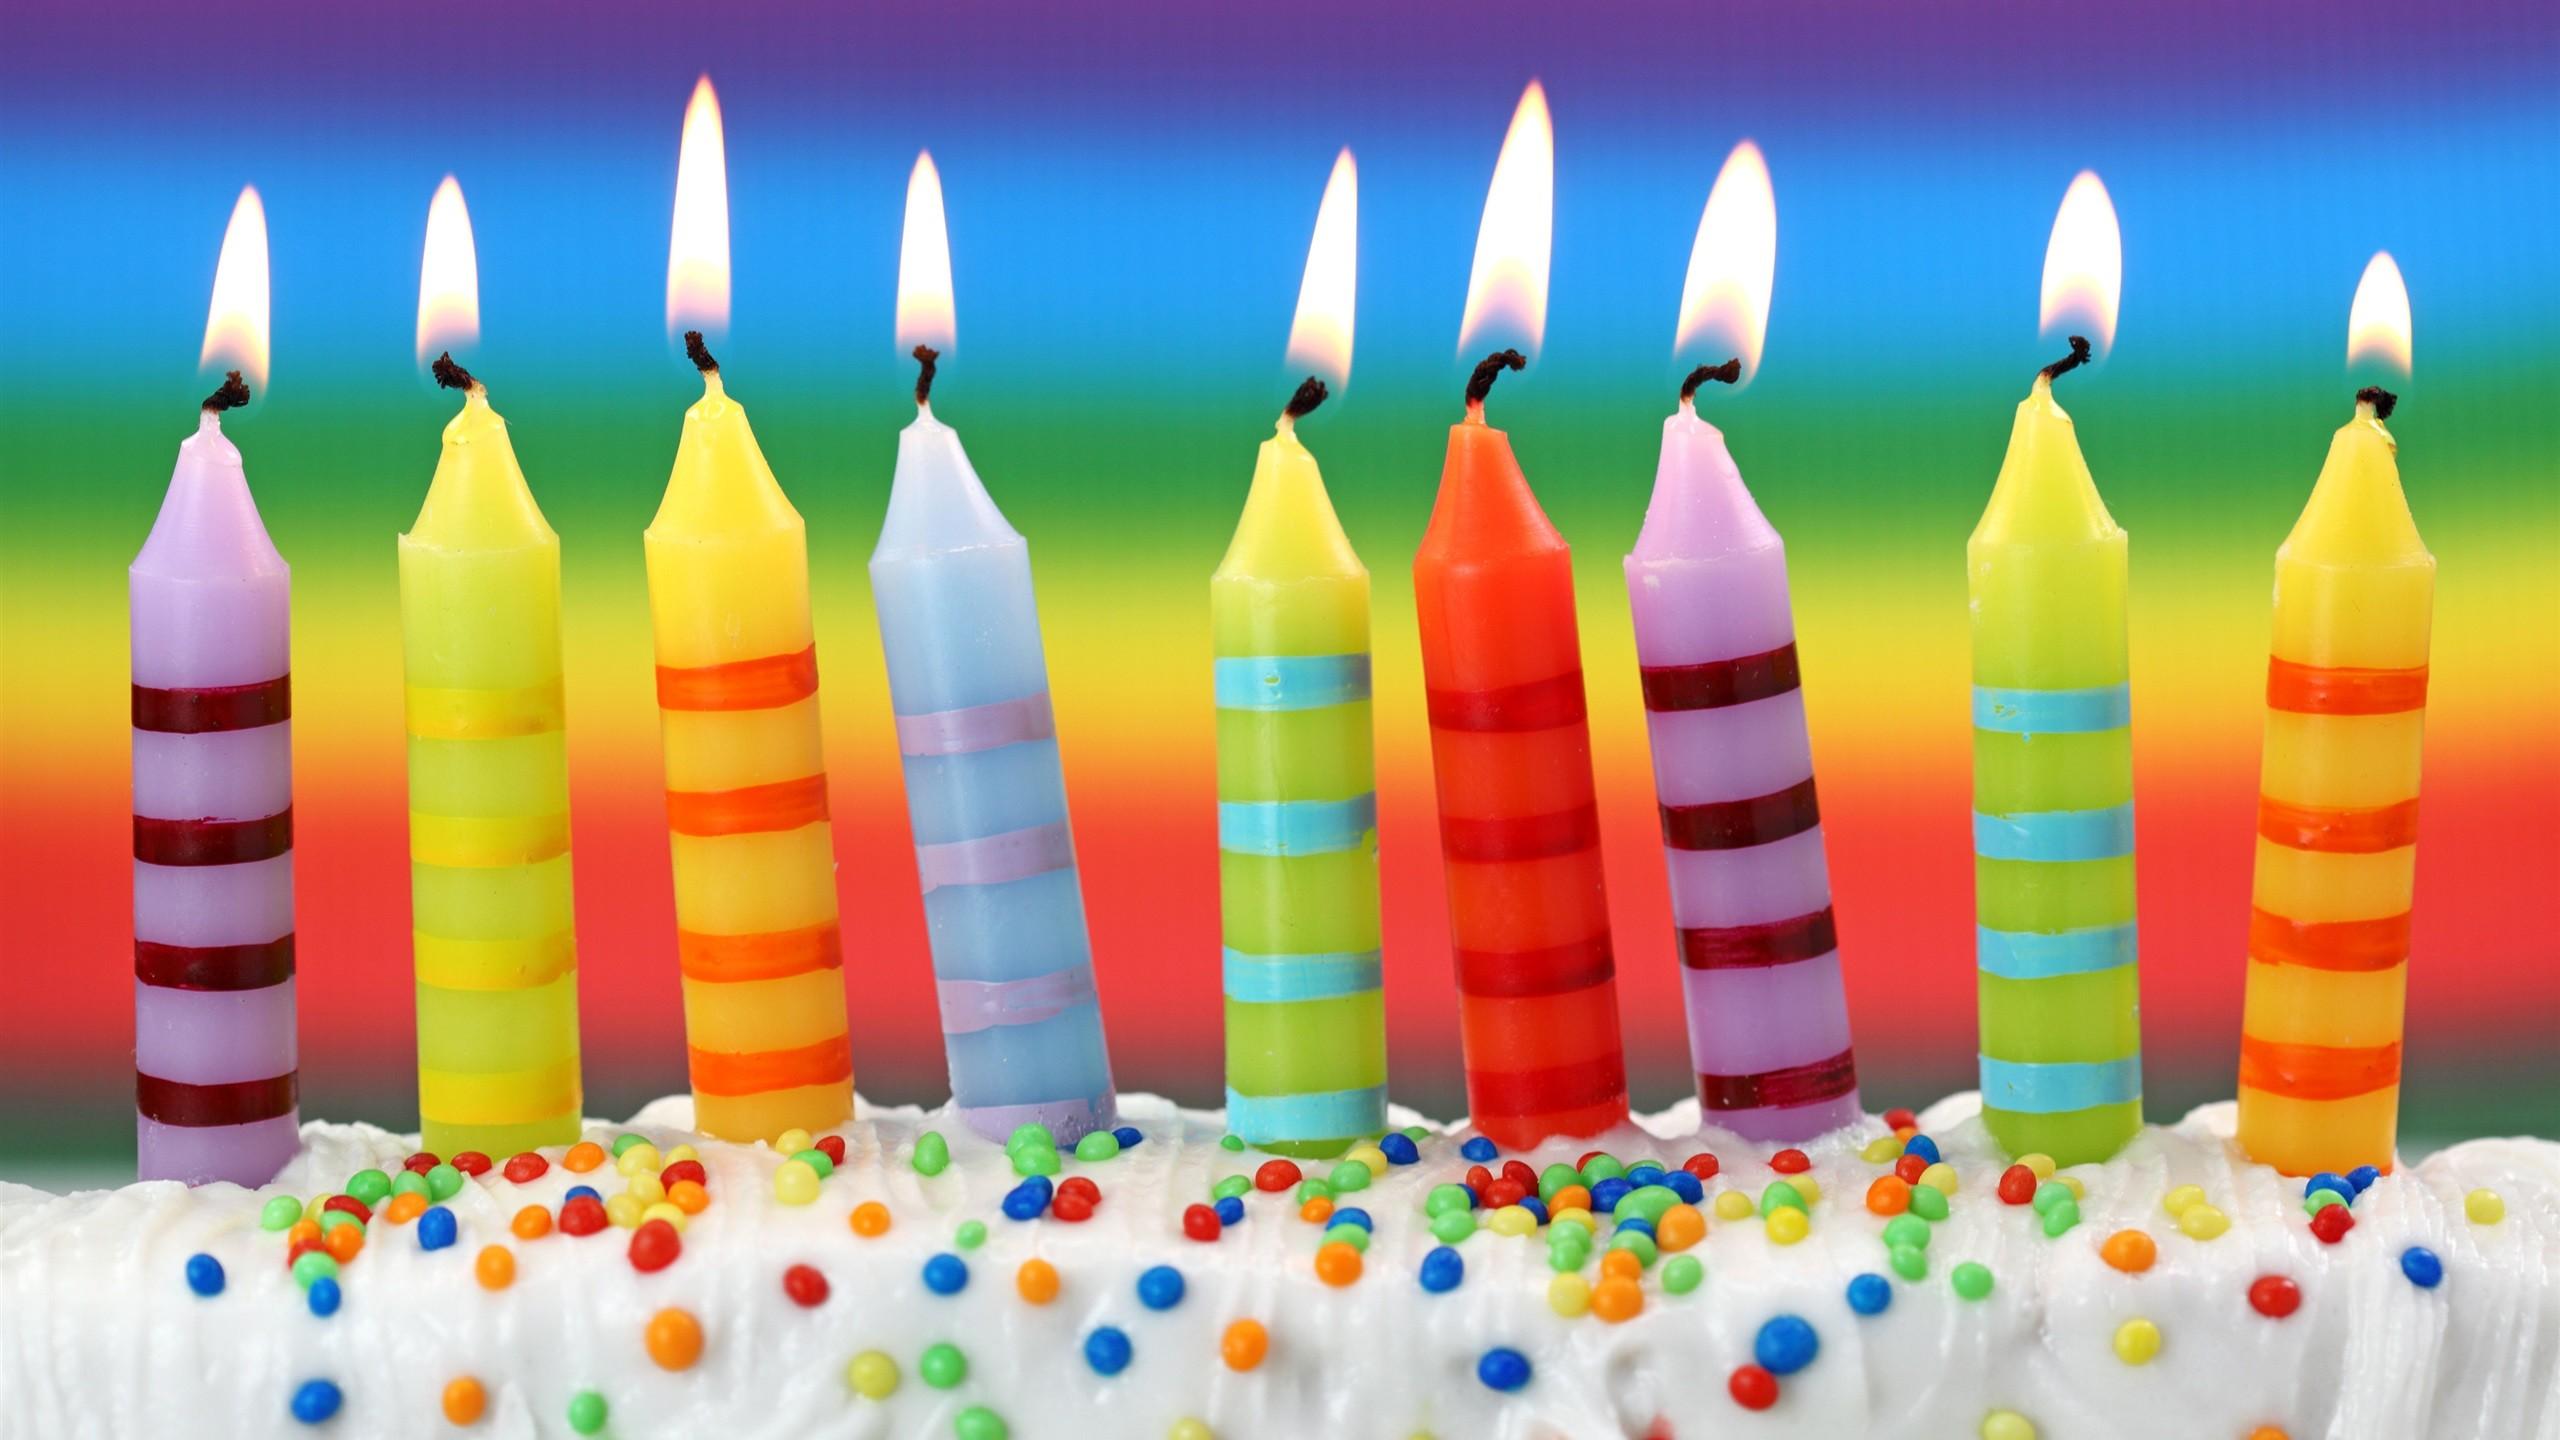 Birthday Cake background computer